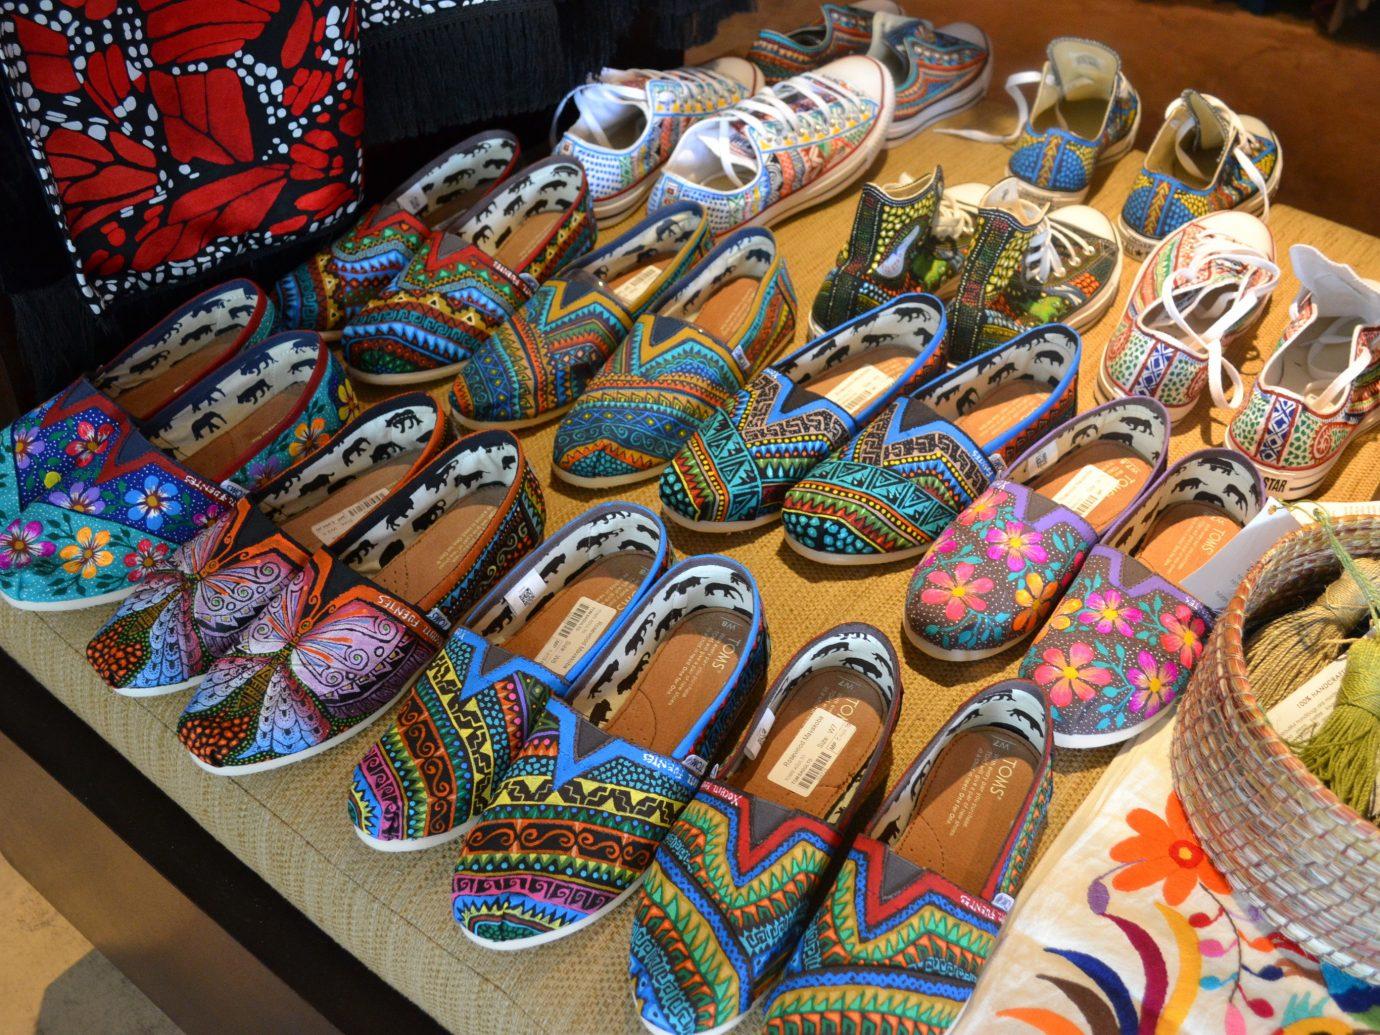 Hotels footwear indoor public space shoe market food art bazaar colorful decorated